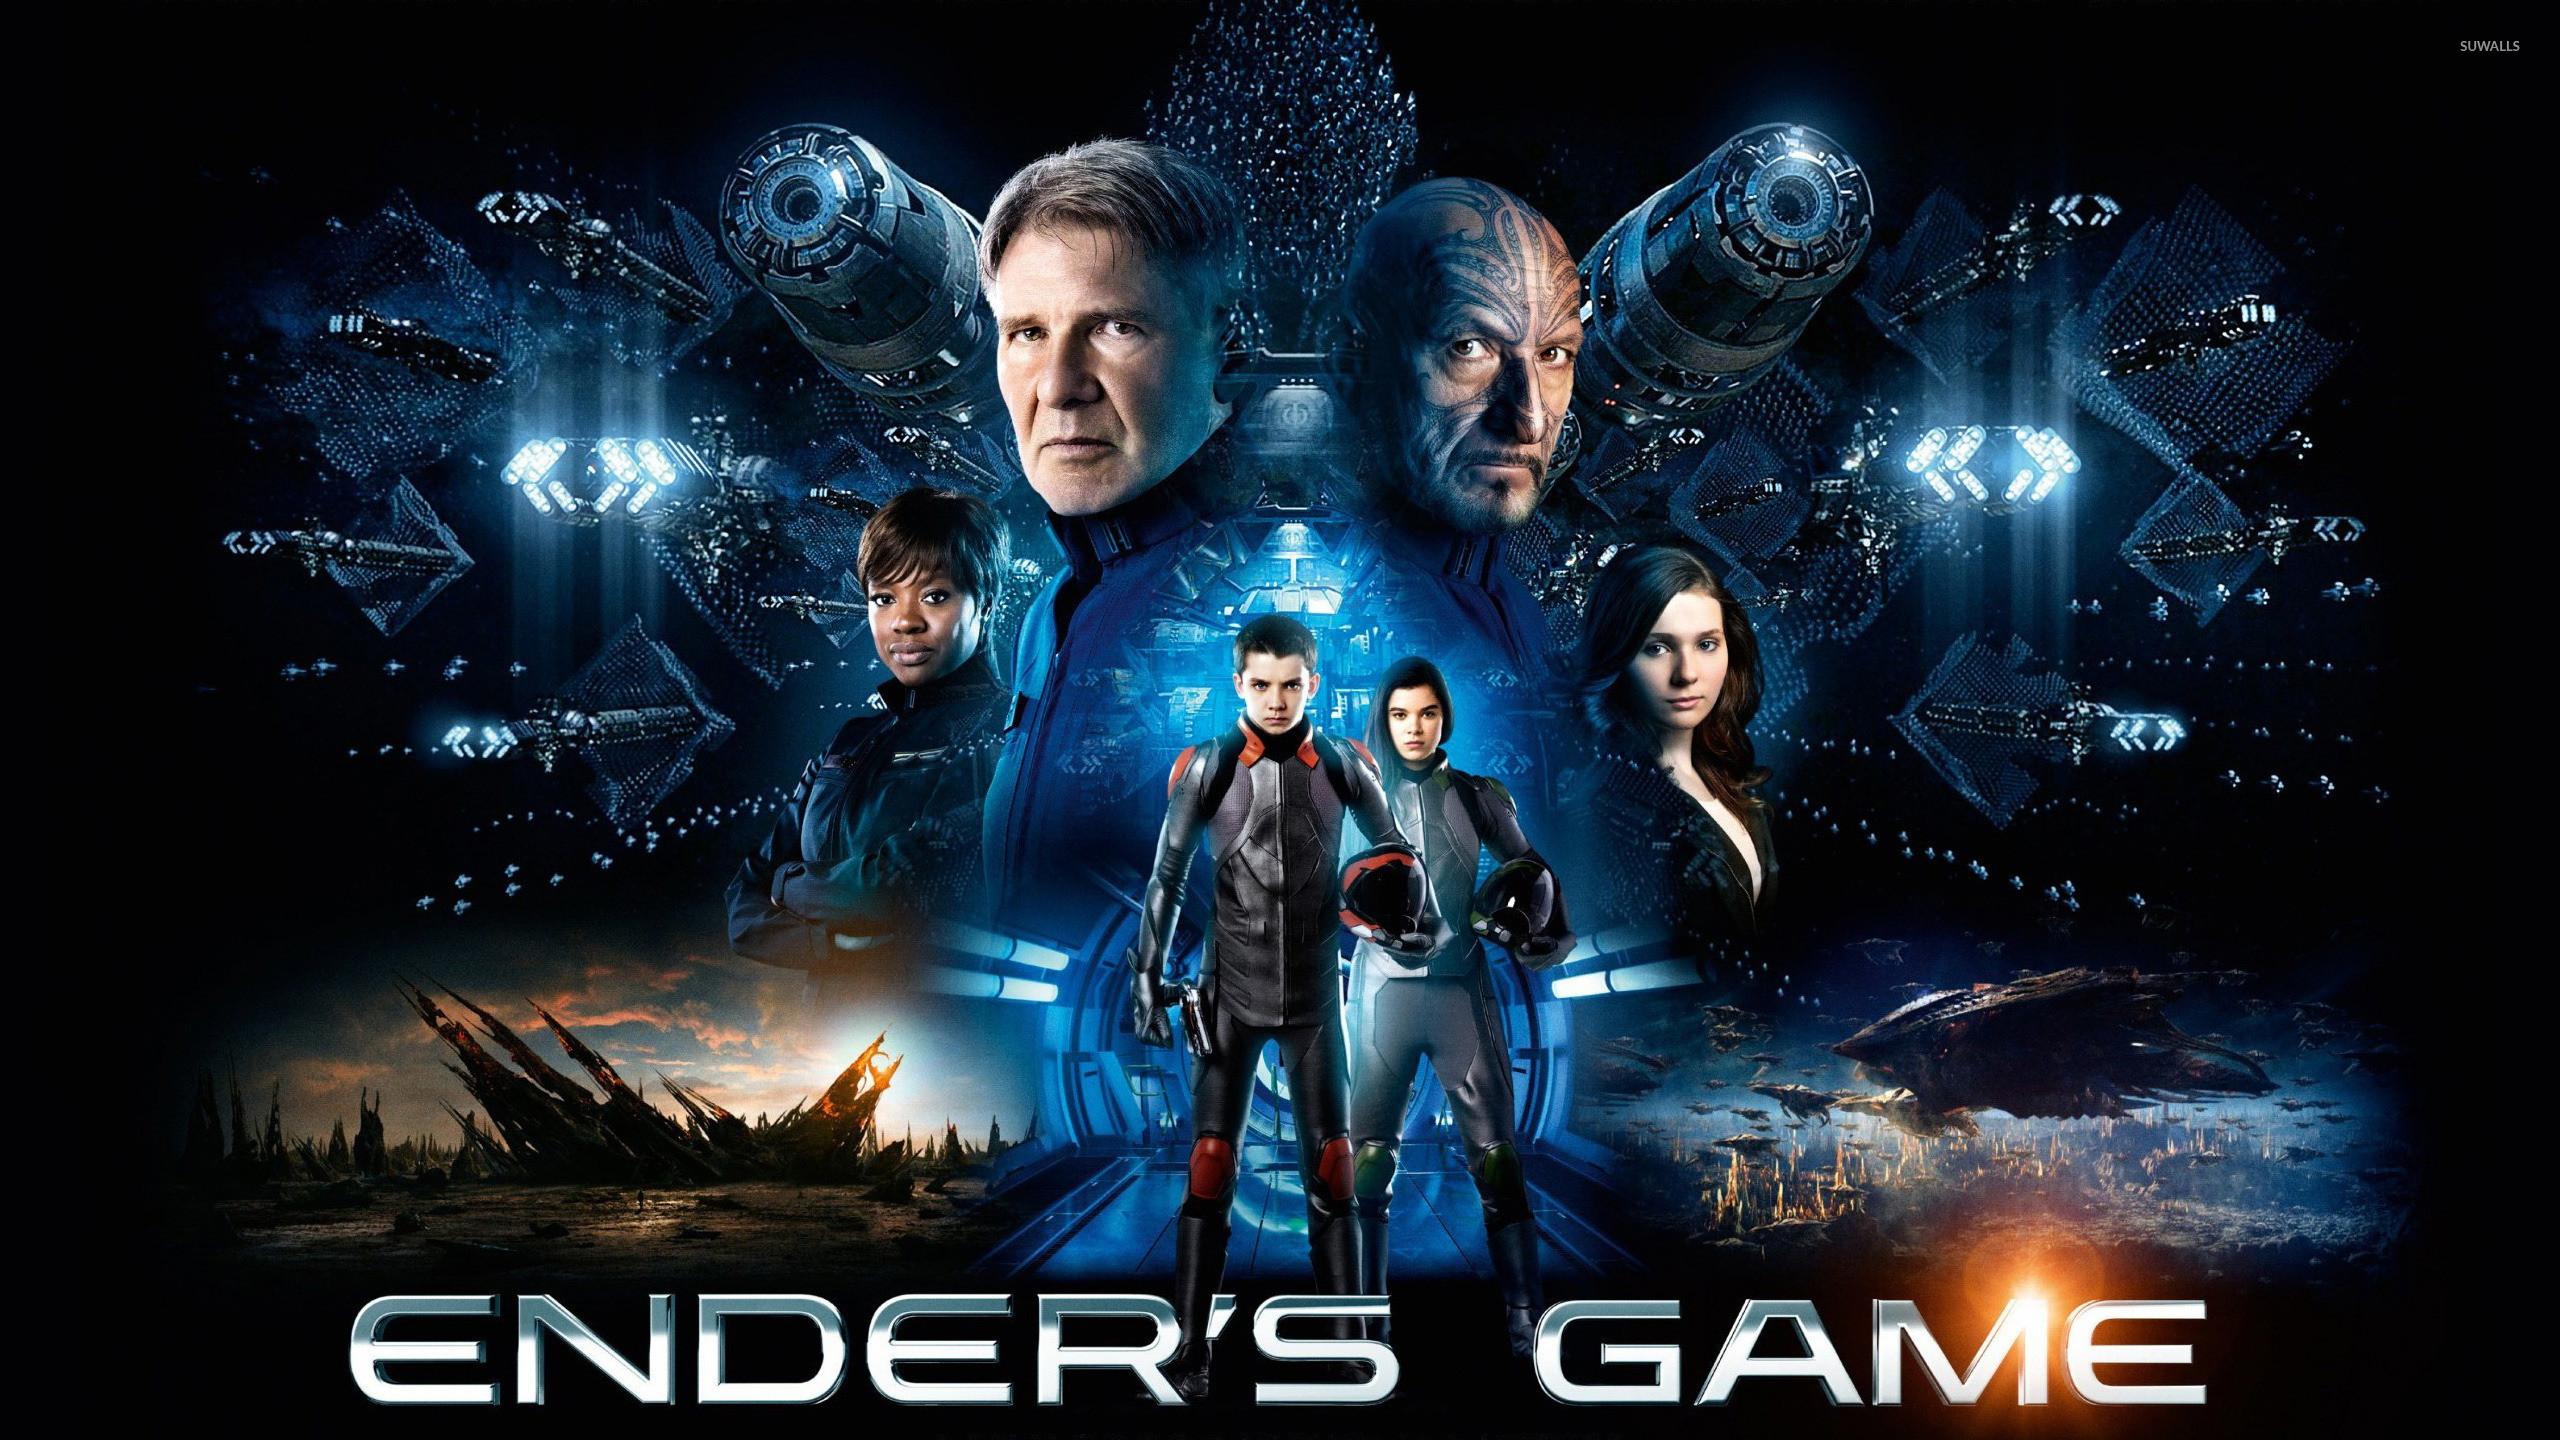 Ender's Game wallpaper